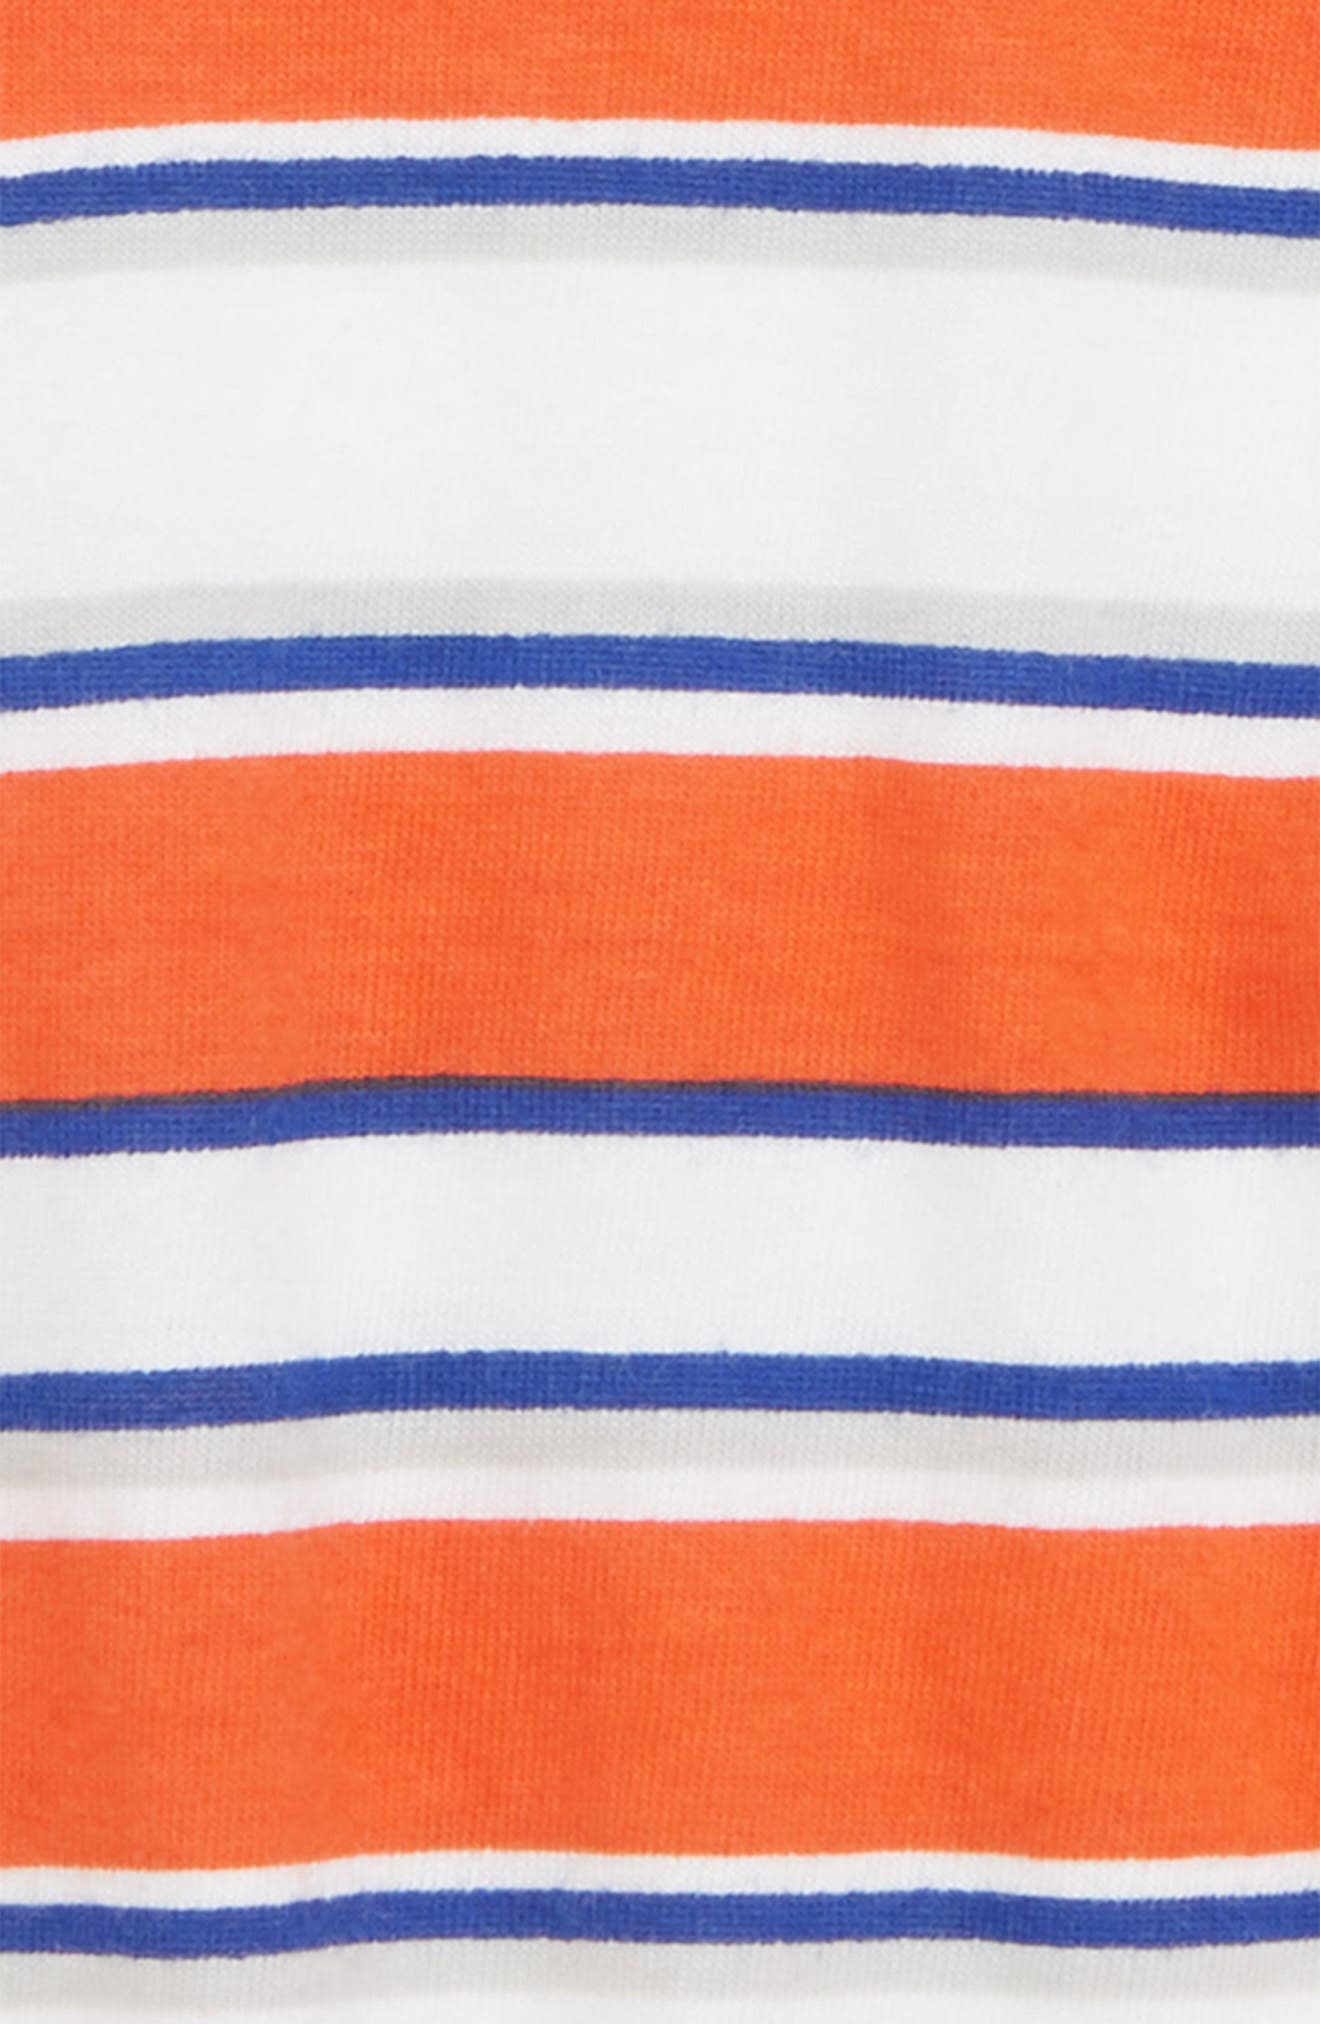 Stripe Romper,                             Alternate thumbnail 2, color,                             Orange Lily Sunset Stripe